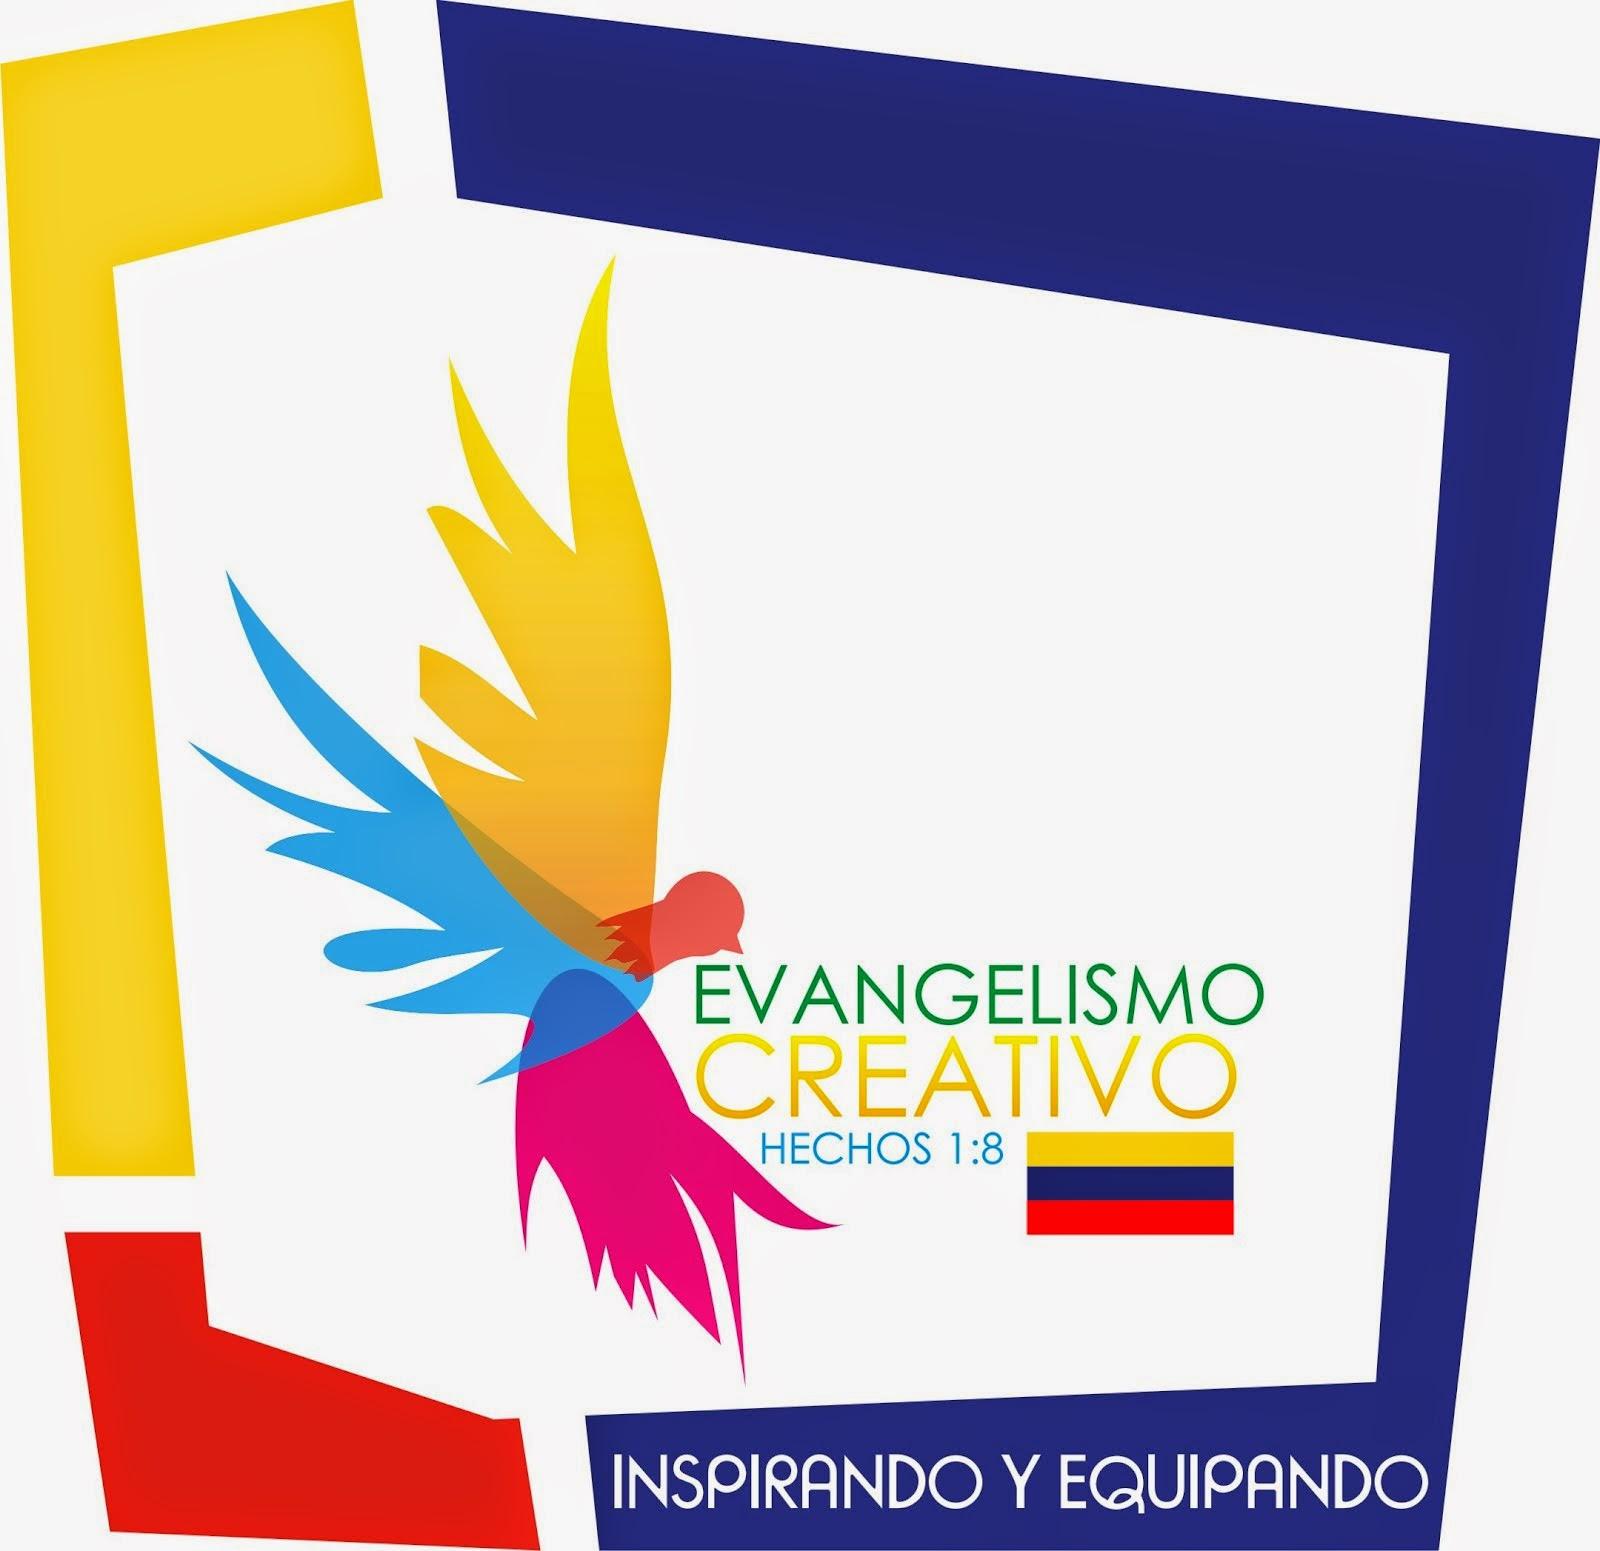 Evangelismo Creativo Venezuela